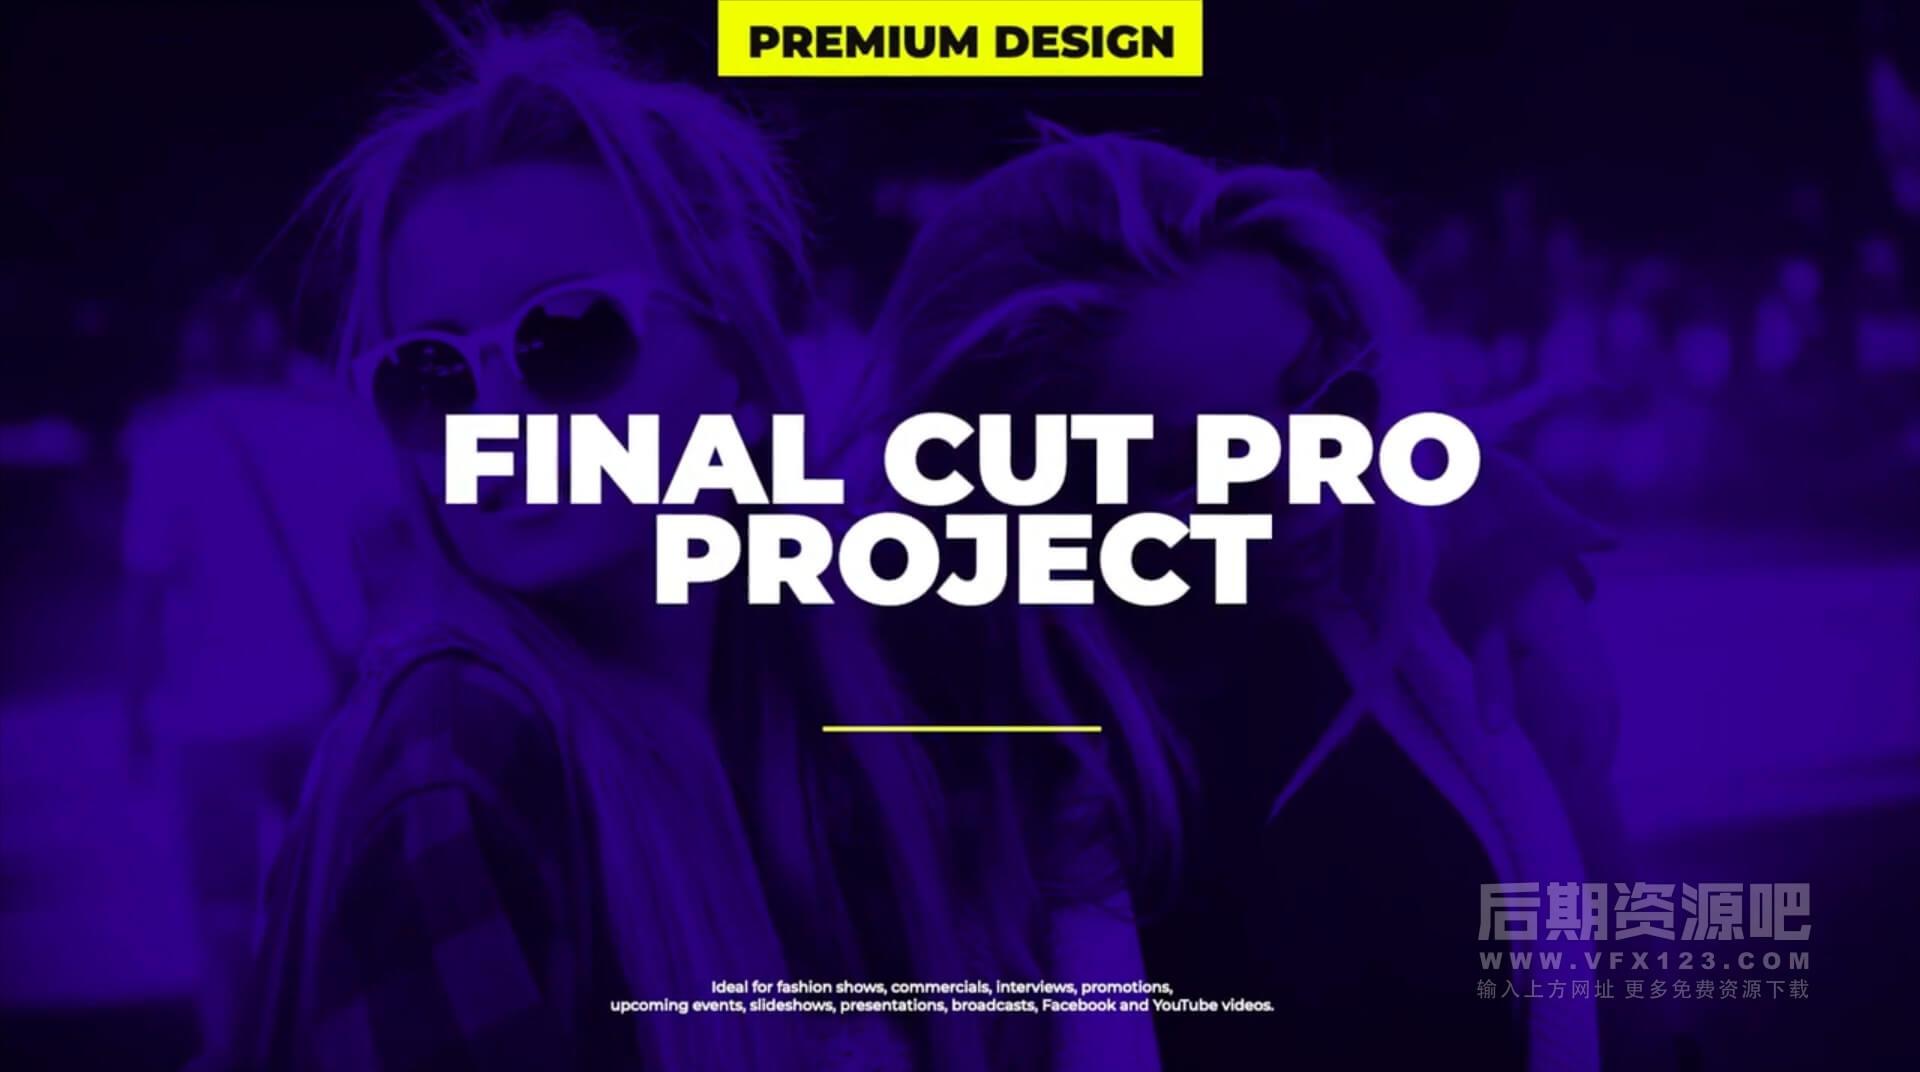 Fcpx插件 12组流行大标题封面侧边栏排版动画 Modern Typo Scenes